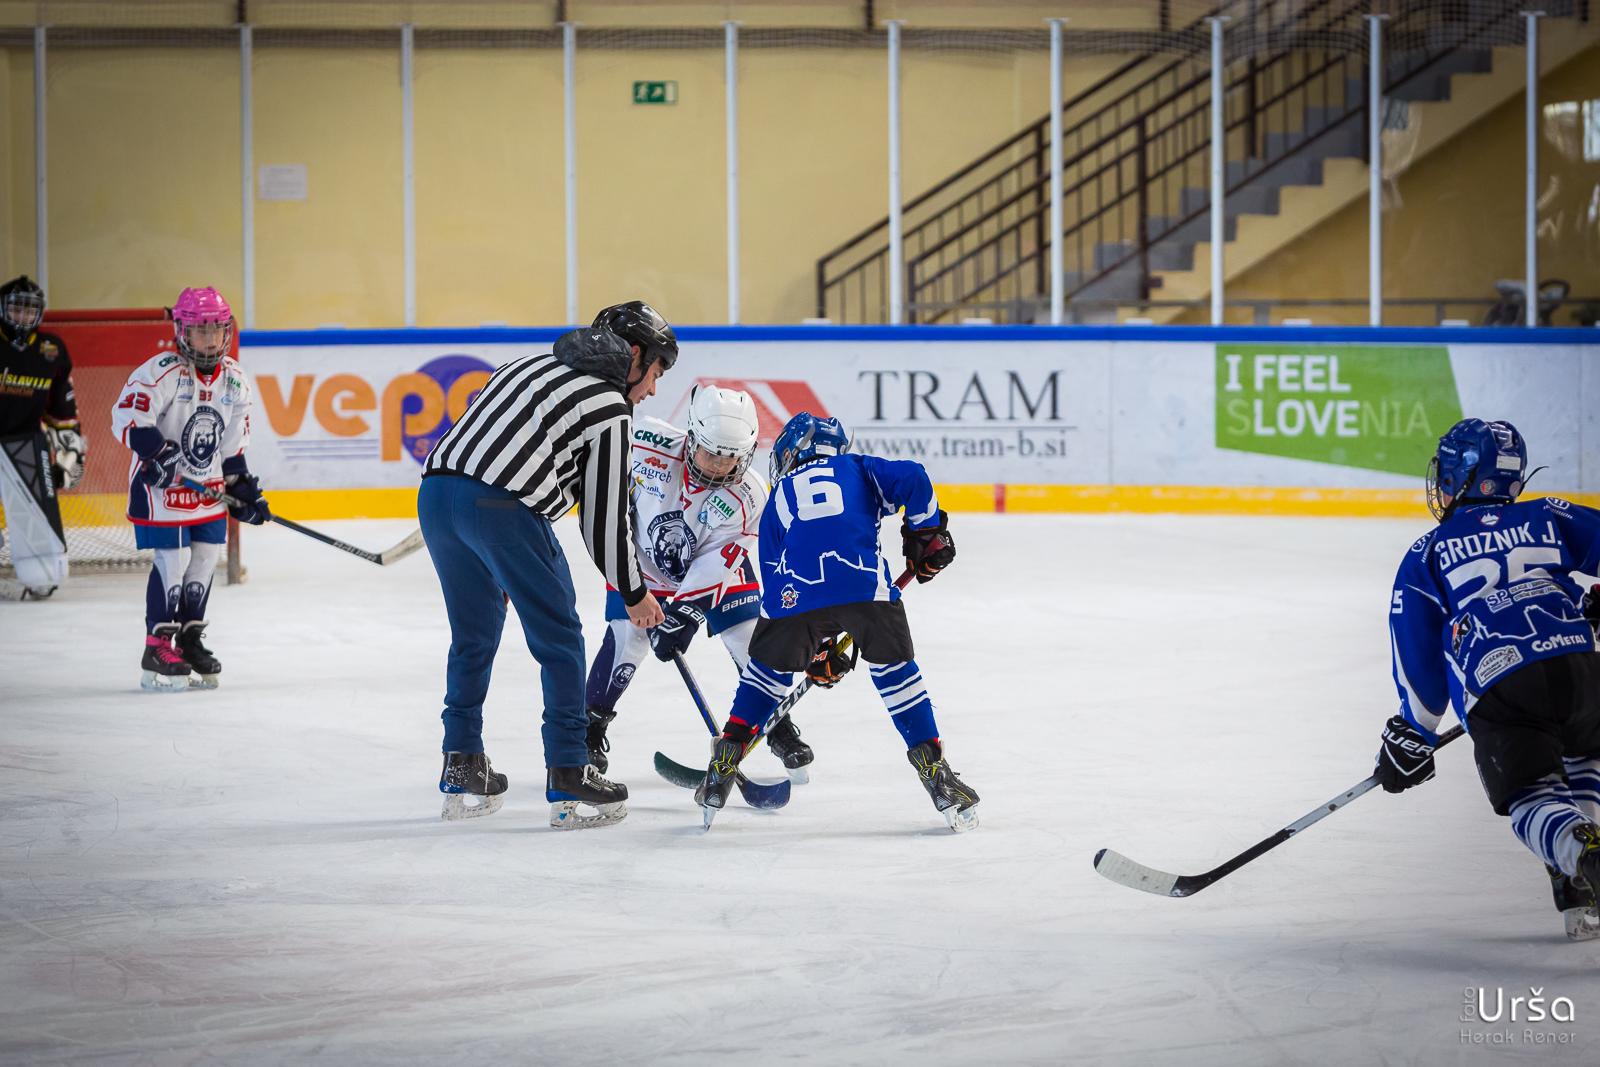 Turnir na Bledu